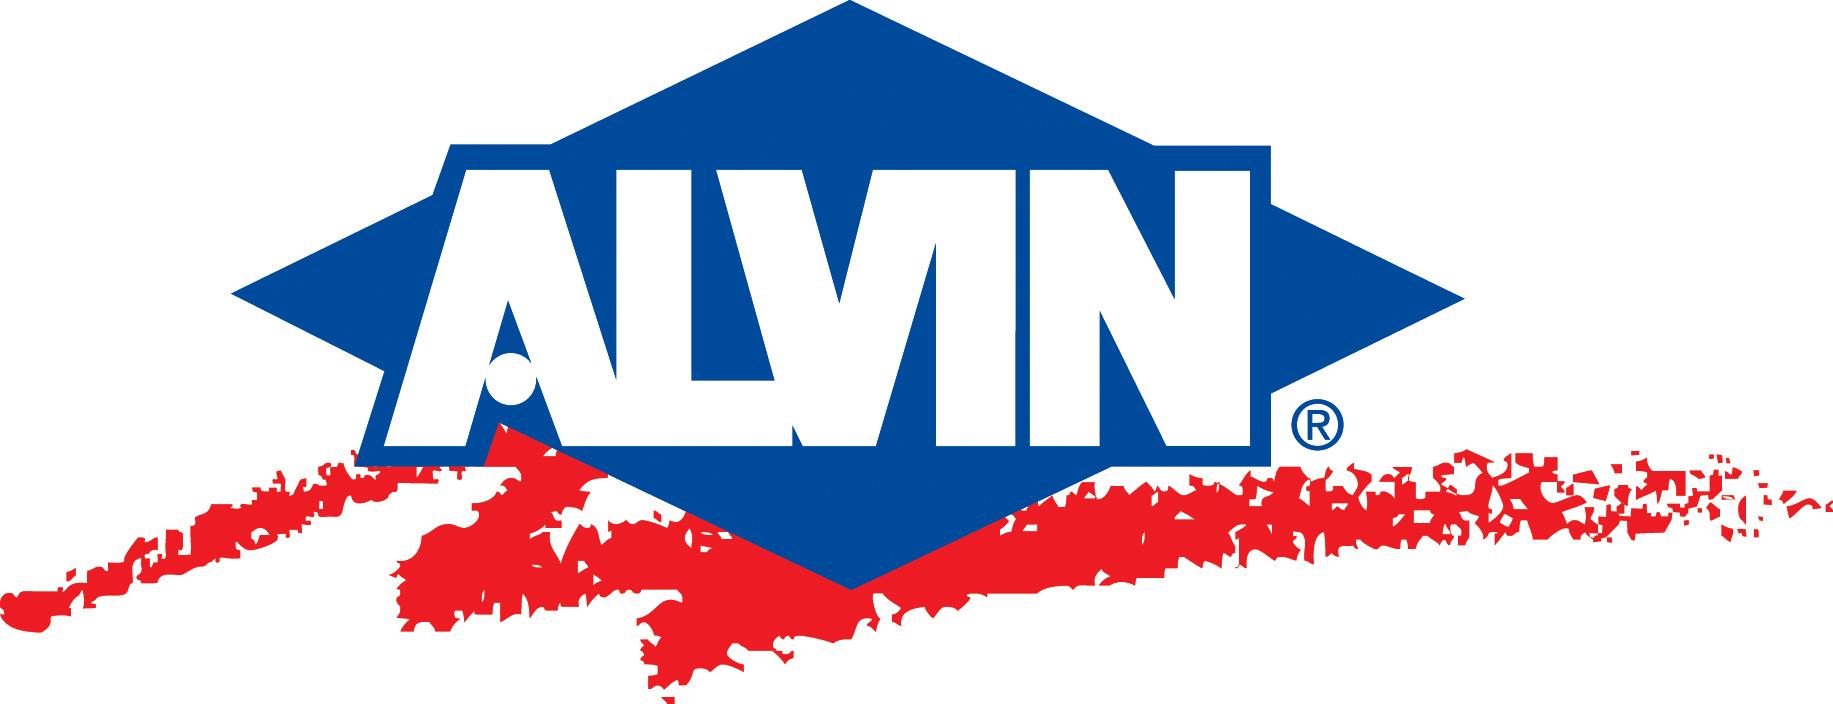 alvin-logo-large-wash.jpg